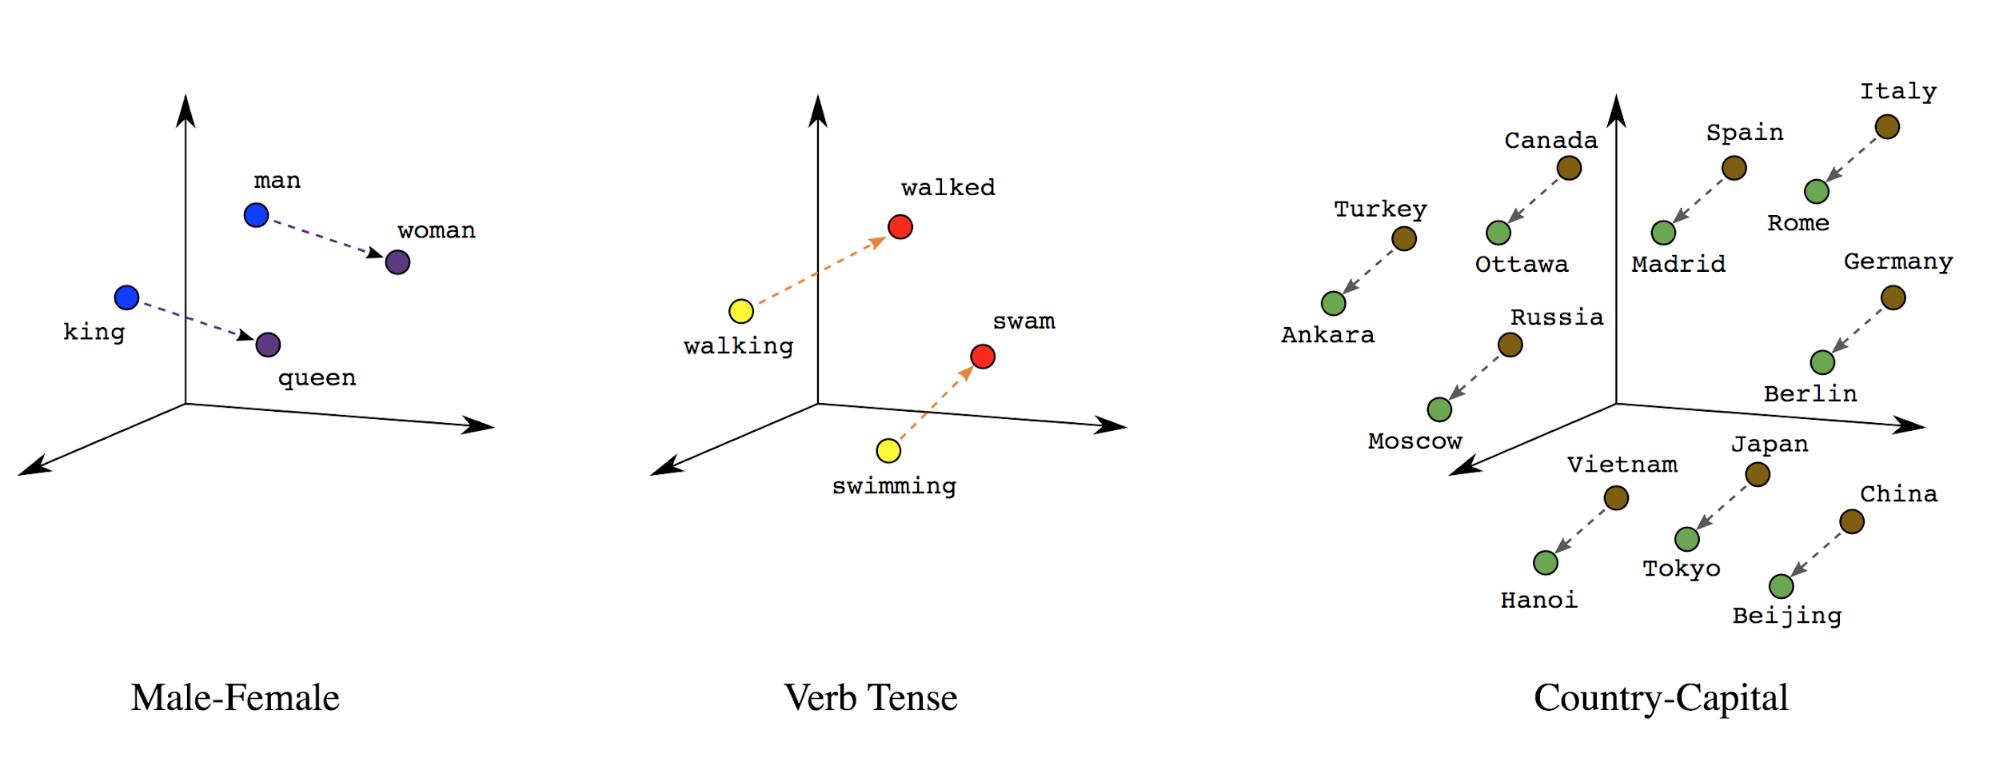 Word Embeddings